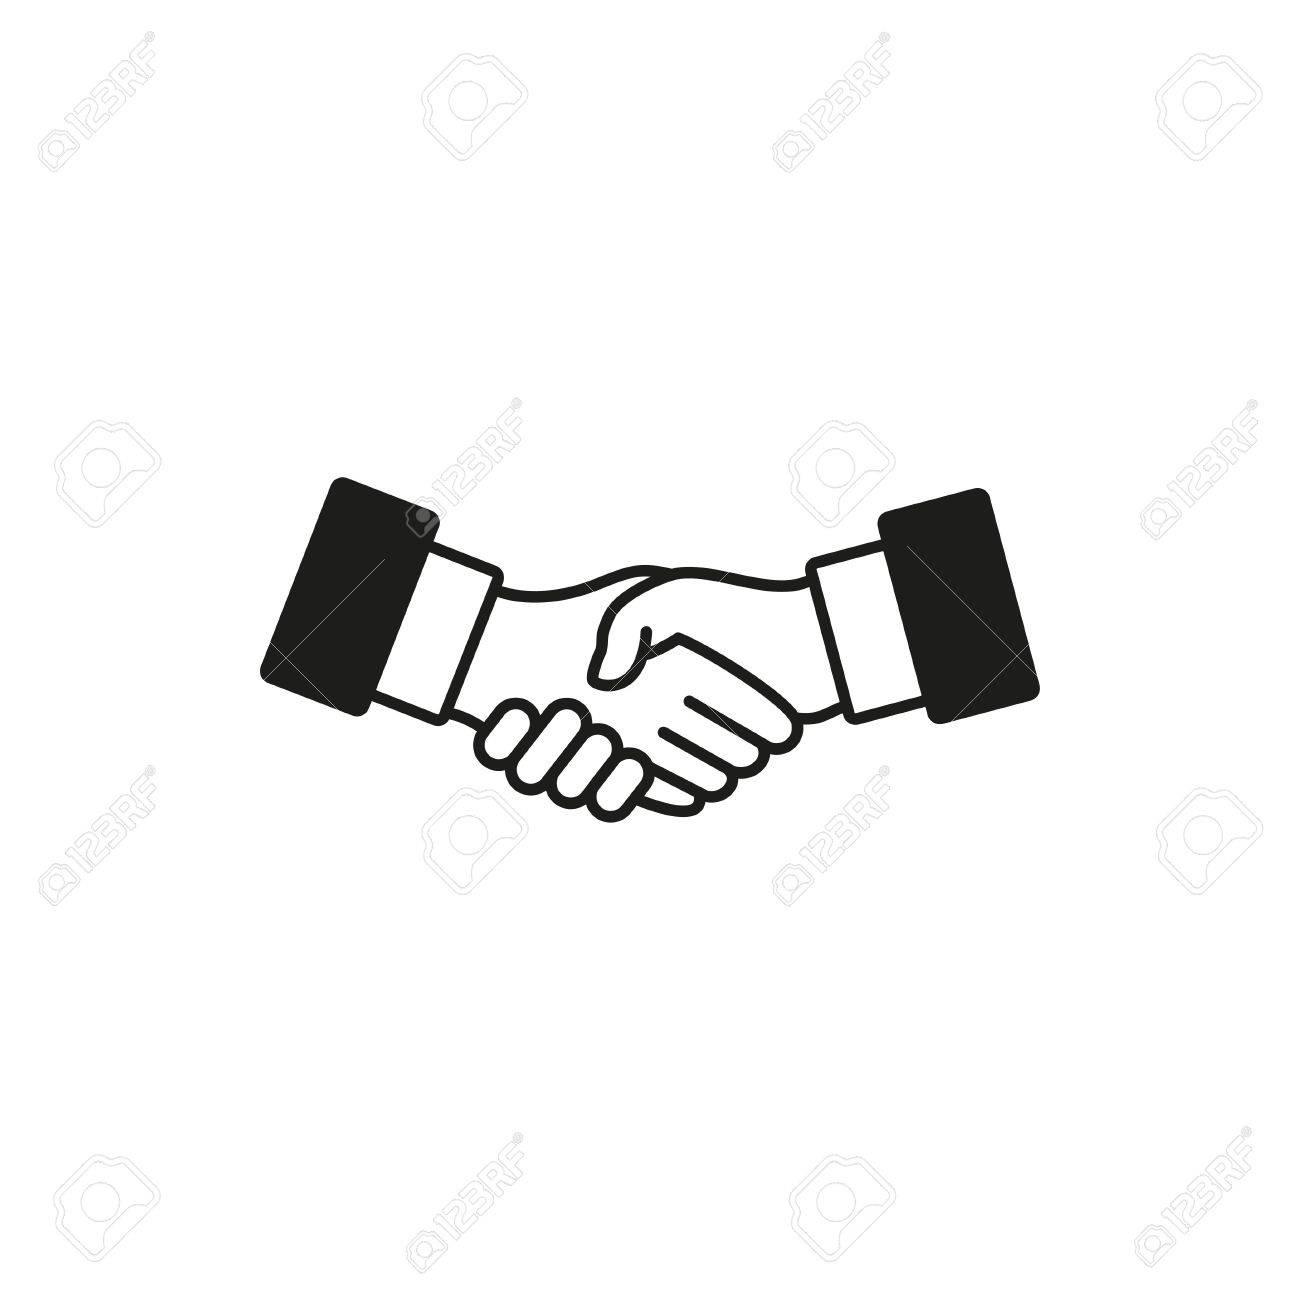 handshake vector icon illustration isolated on white background rh 123rf com handshake vector image vector handshake icon